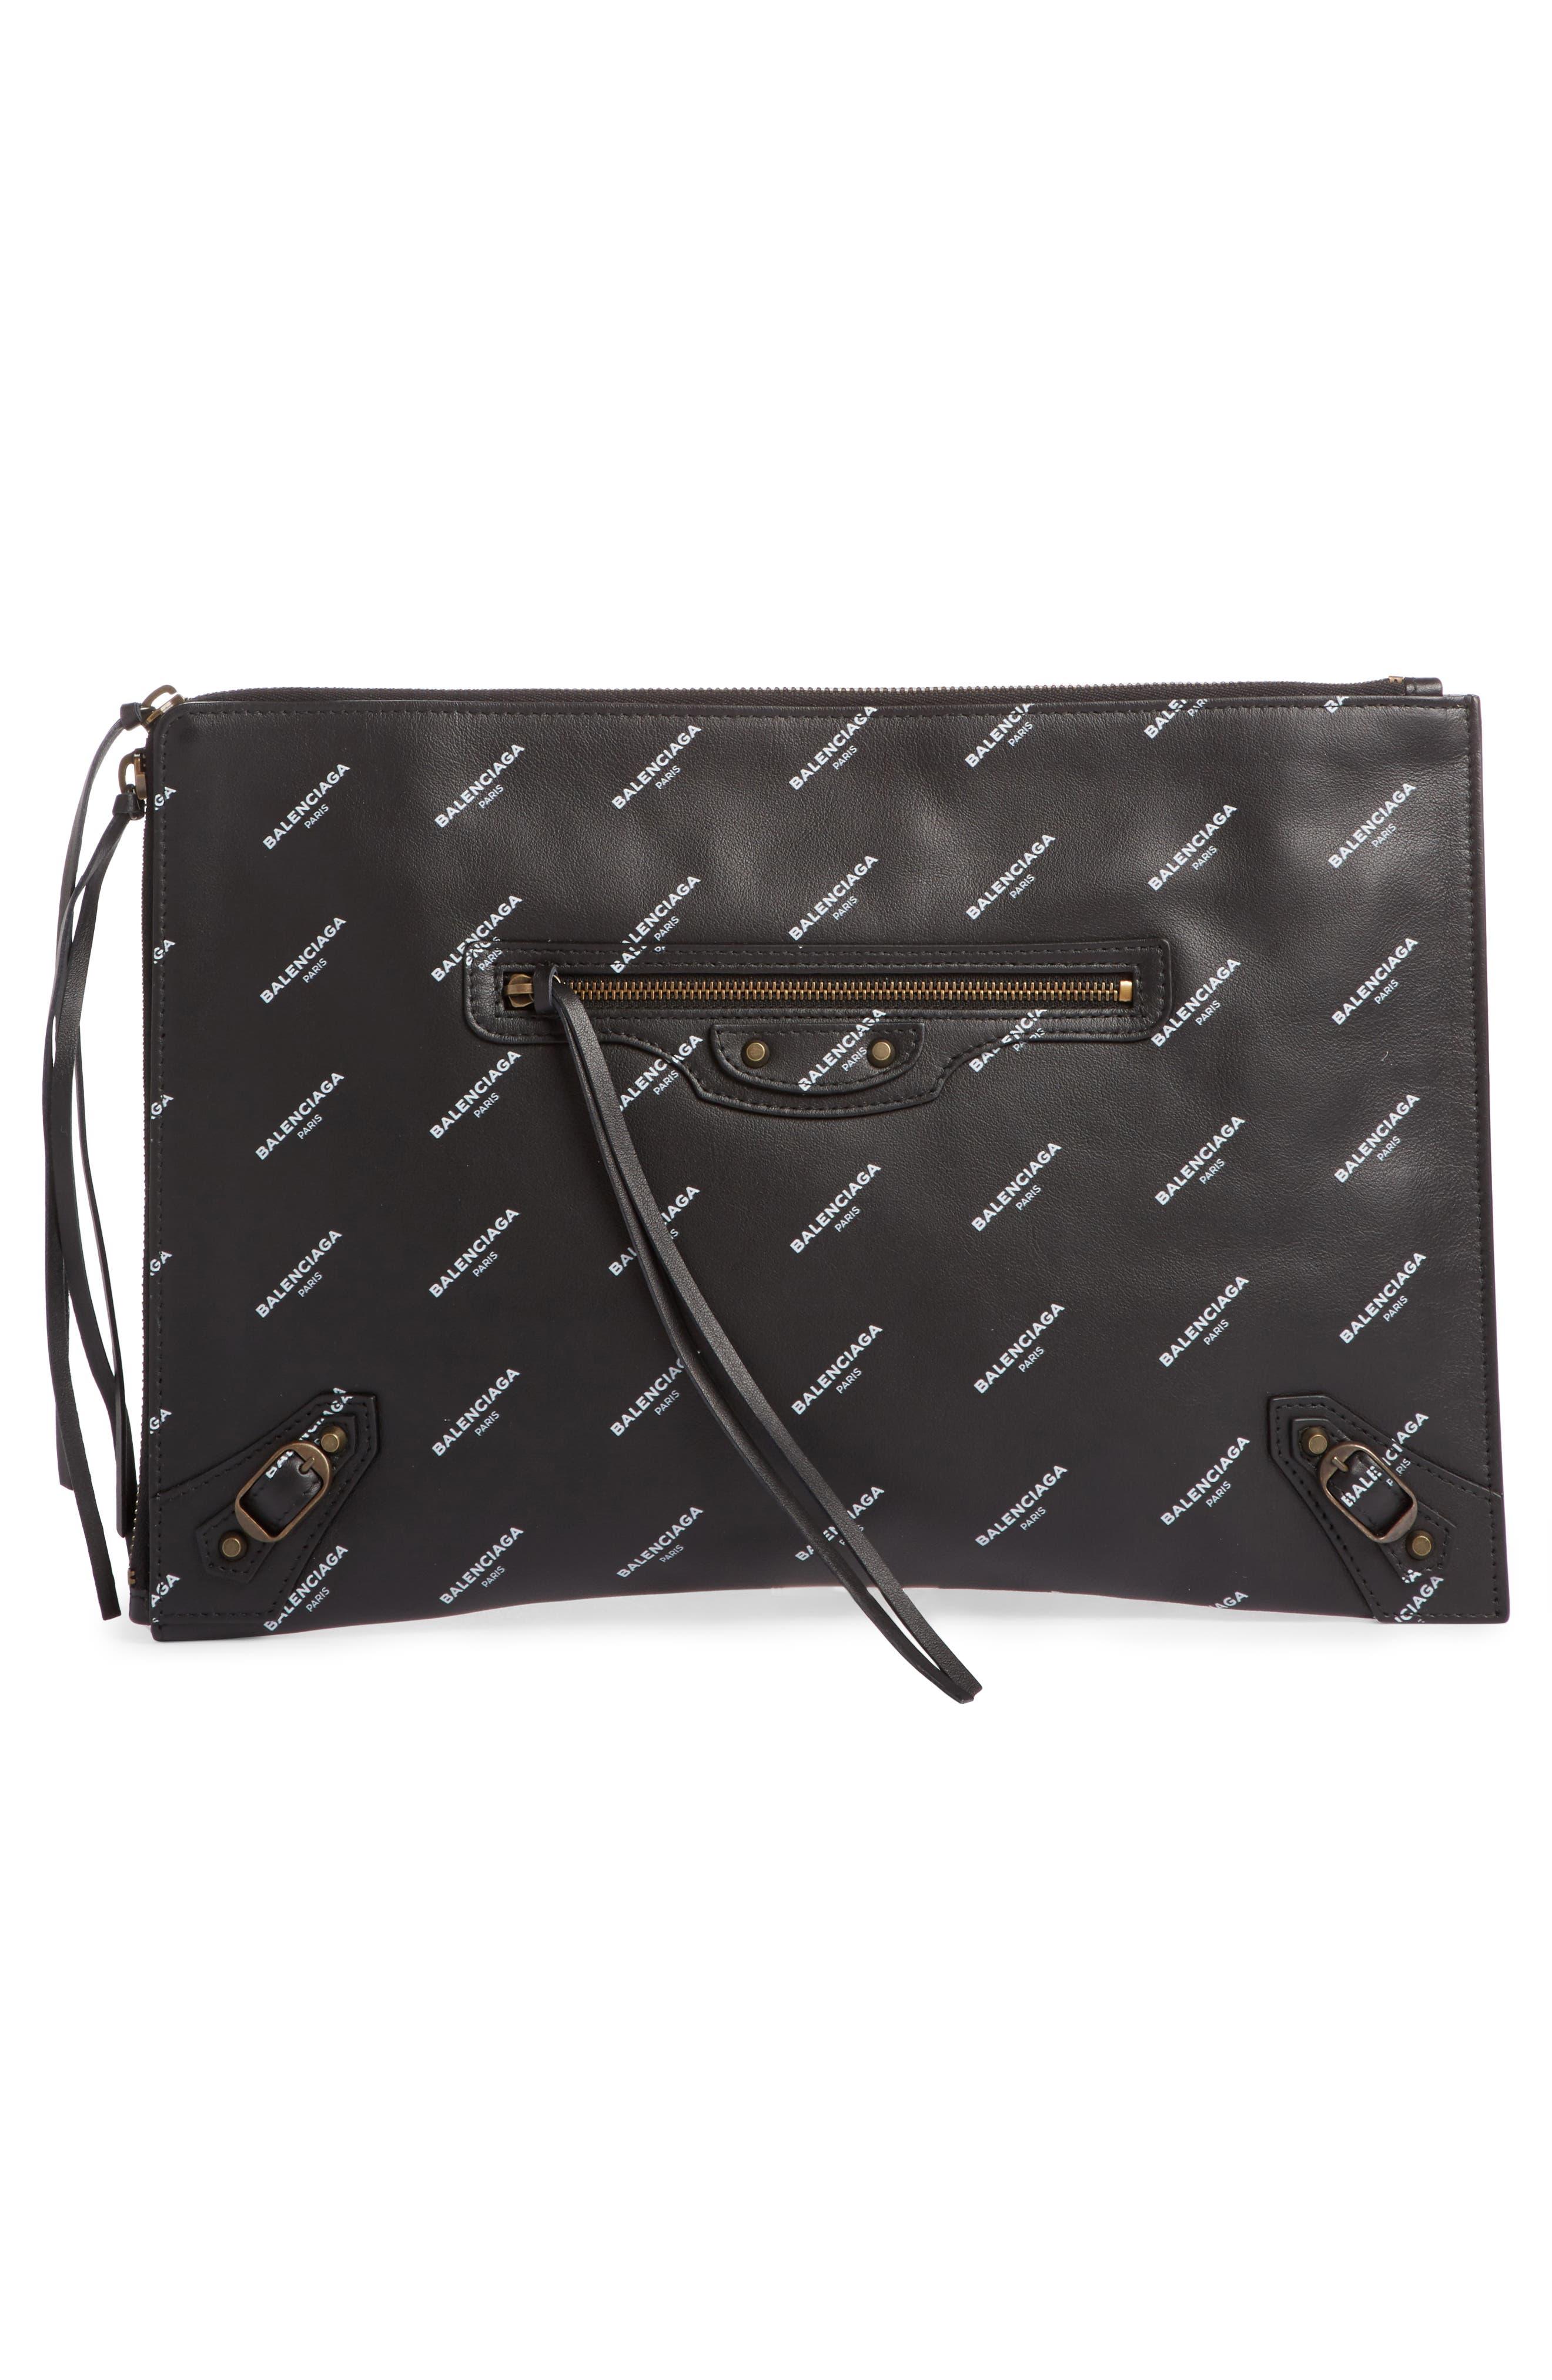 Balenciaga Classic Leather Pouch